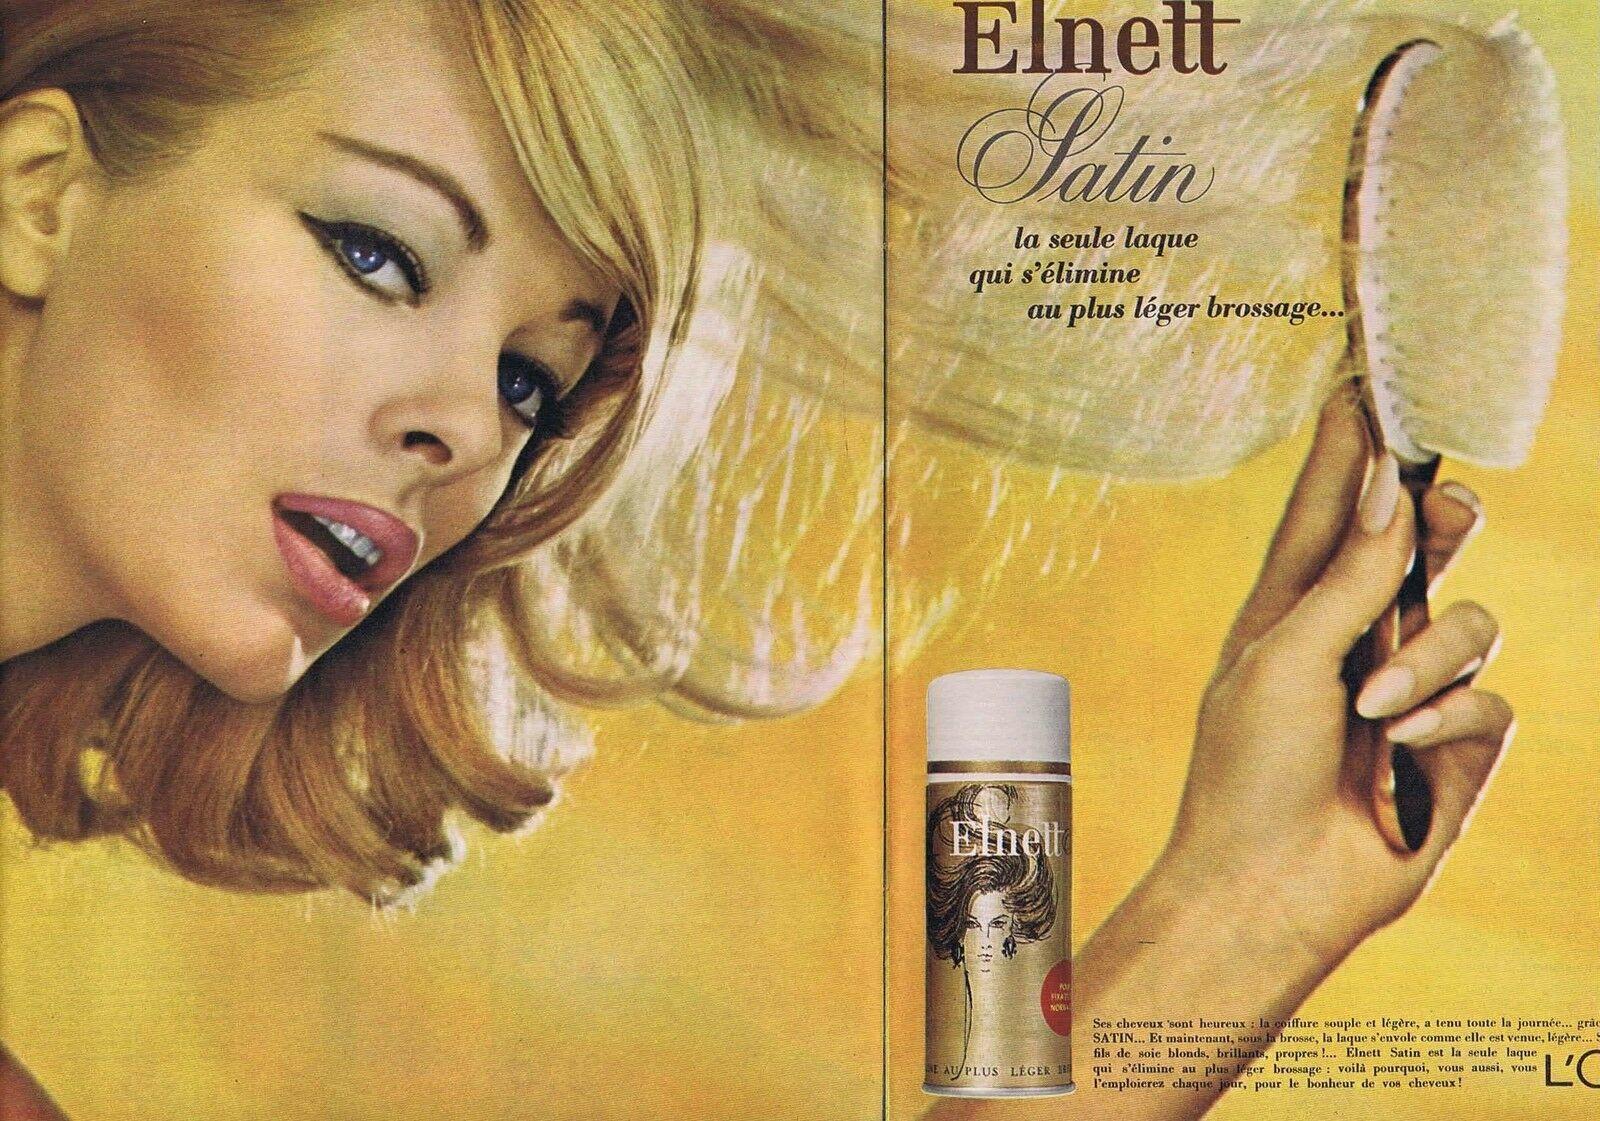 1965 L'OREAL Elnett satin laque